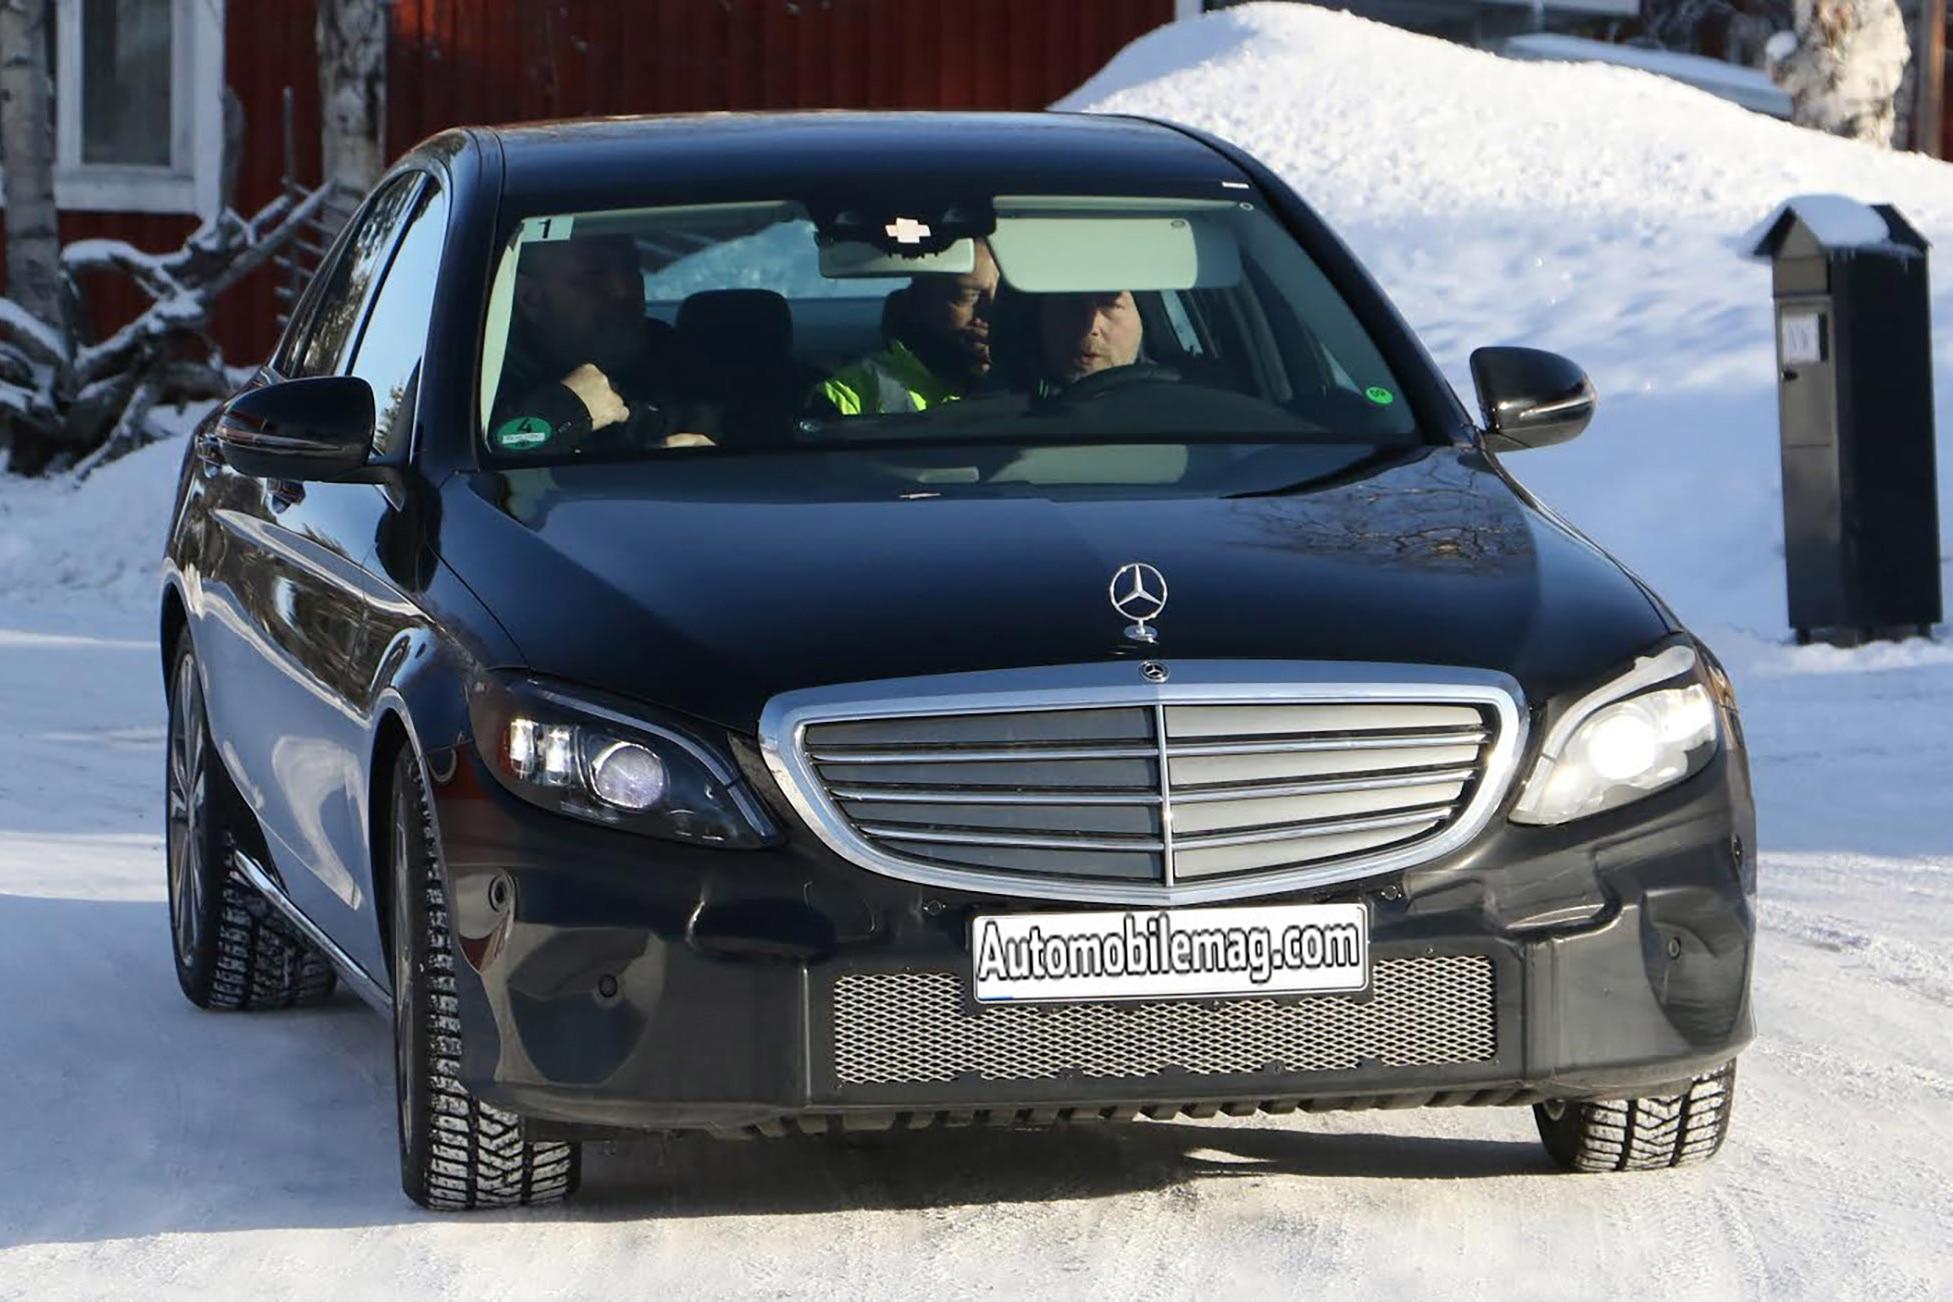 Mercedes Benz C Class Spy Shots Front 01